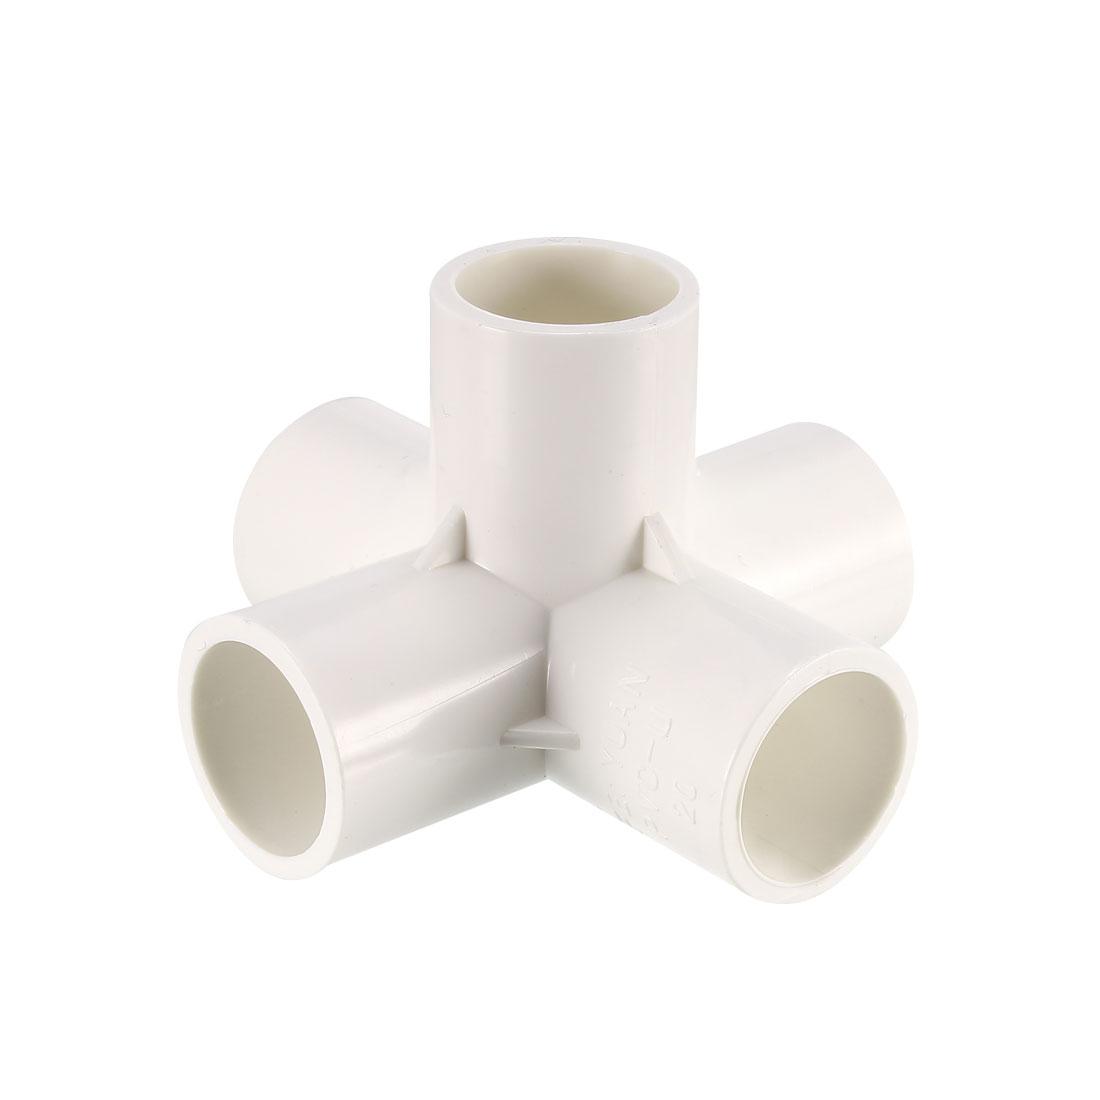 5 Way 20mm Tee PVC Fitting Elbow - PVC Furniture - PVC Elbow Fittings 6Pcs